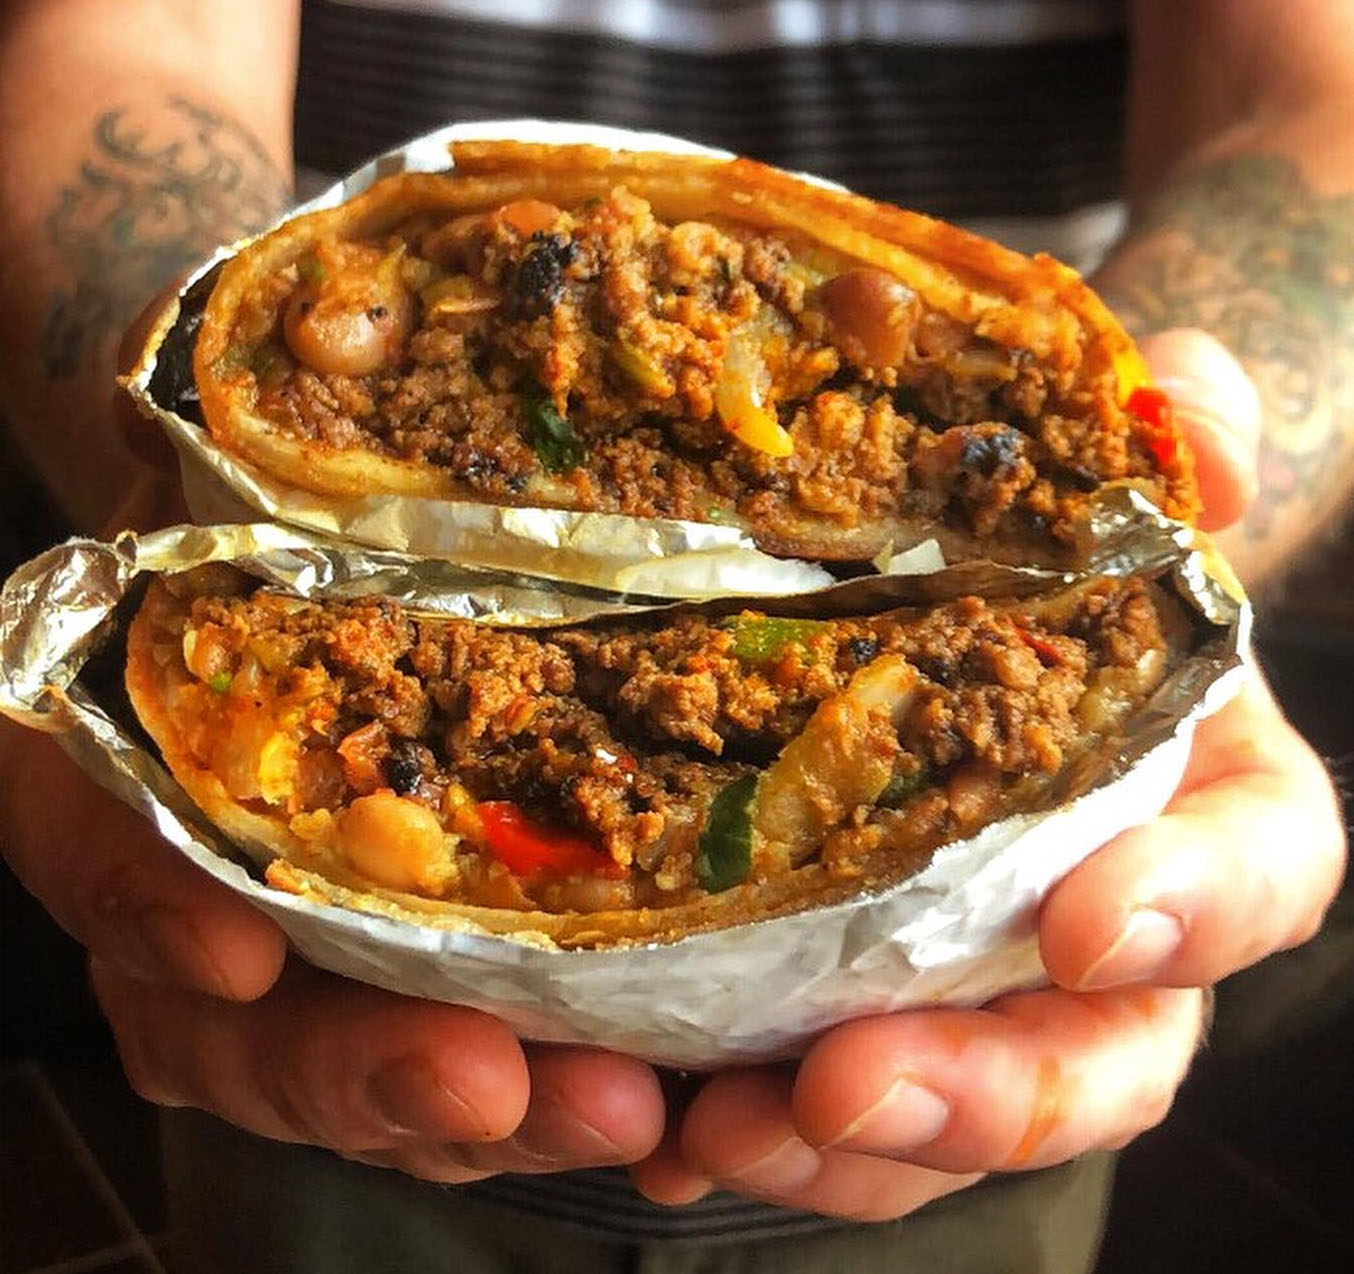 Where to Eat In Edmonton - Taqueria Tres Carnales